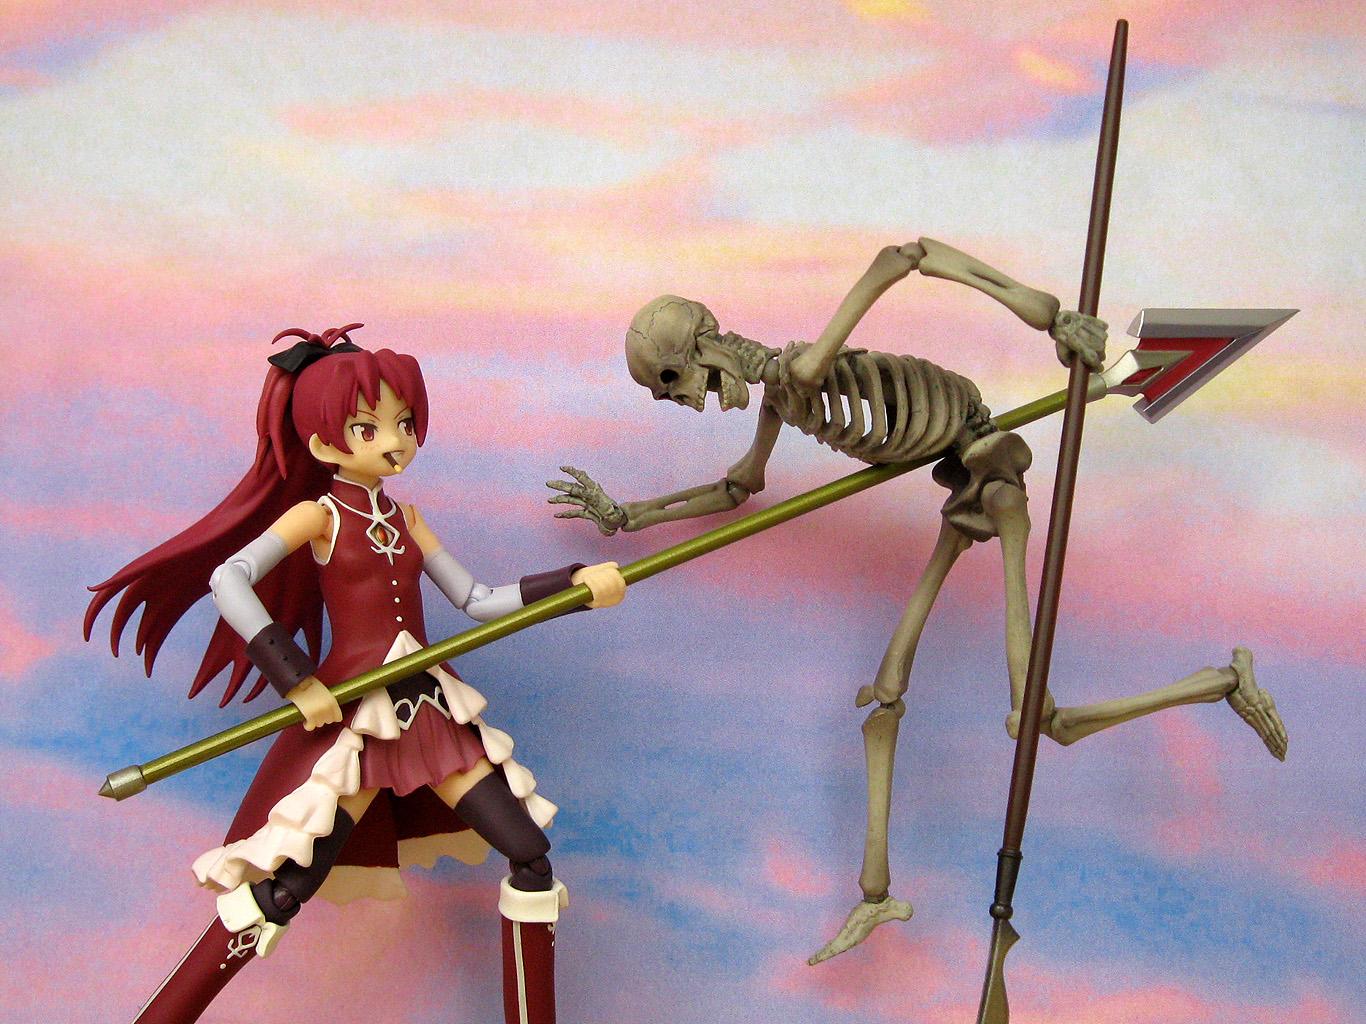 world of klaymore: figma Kyoko Sakura